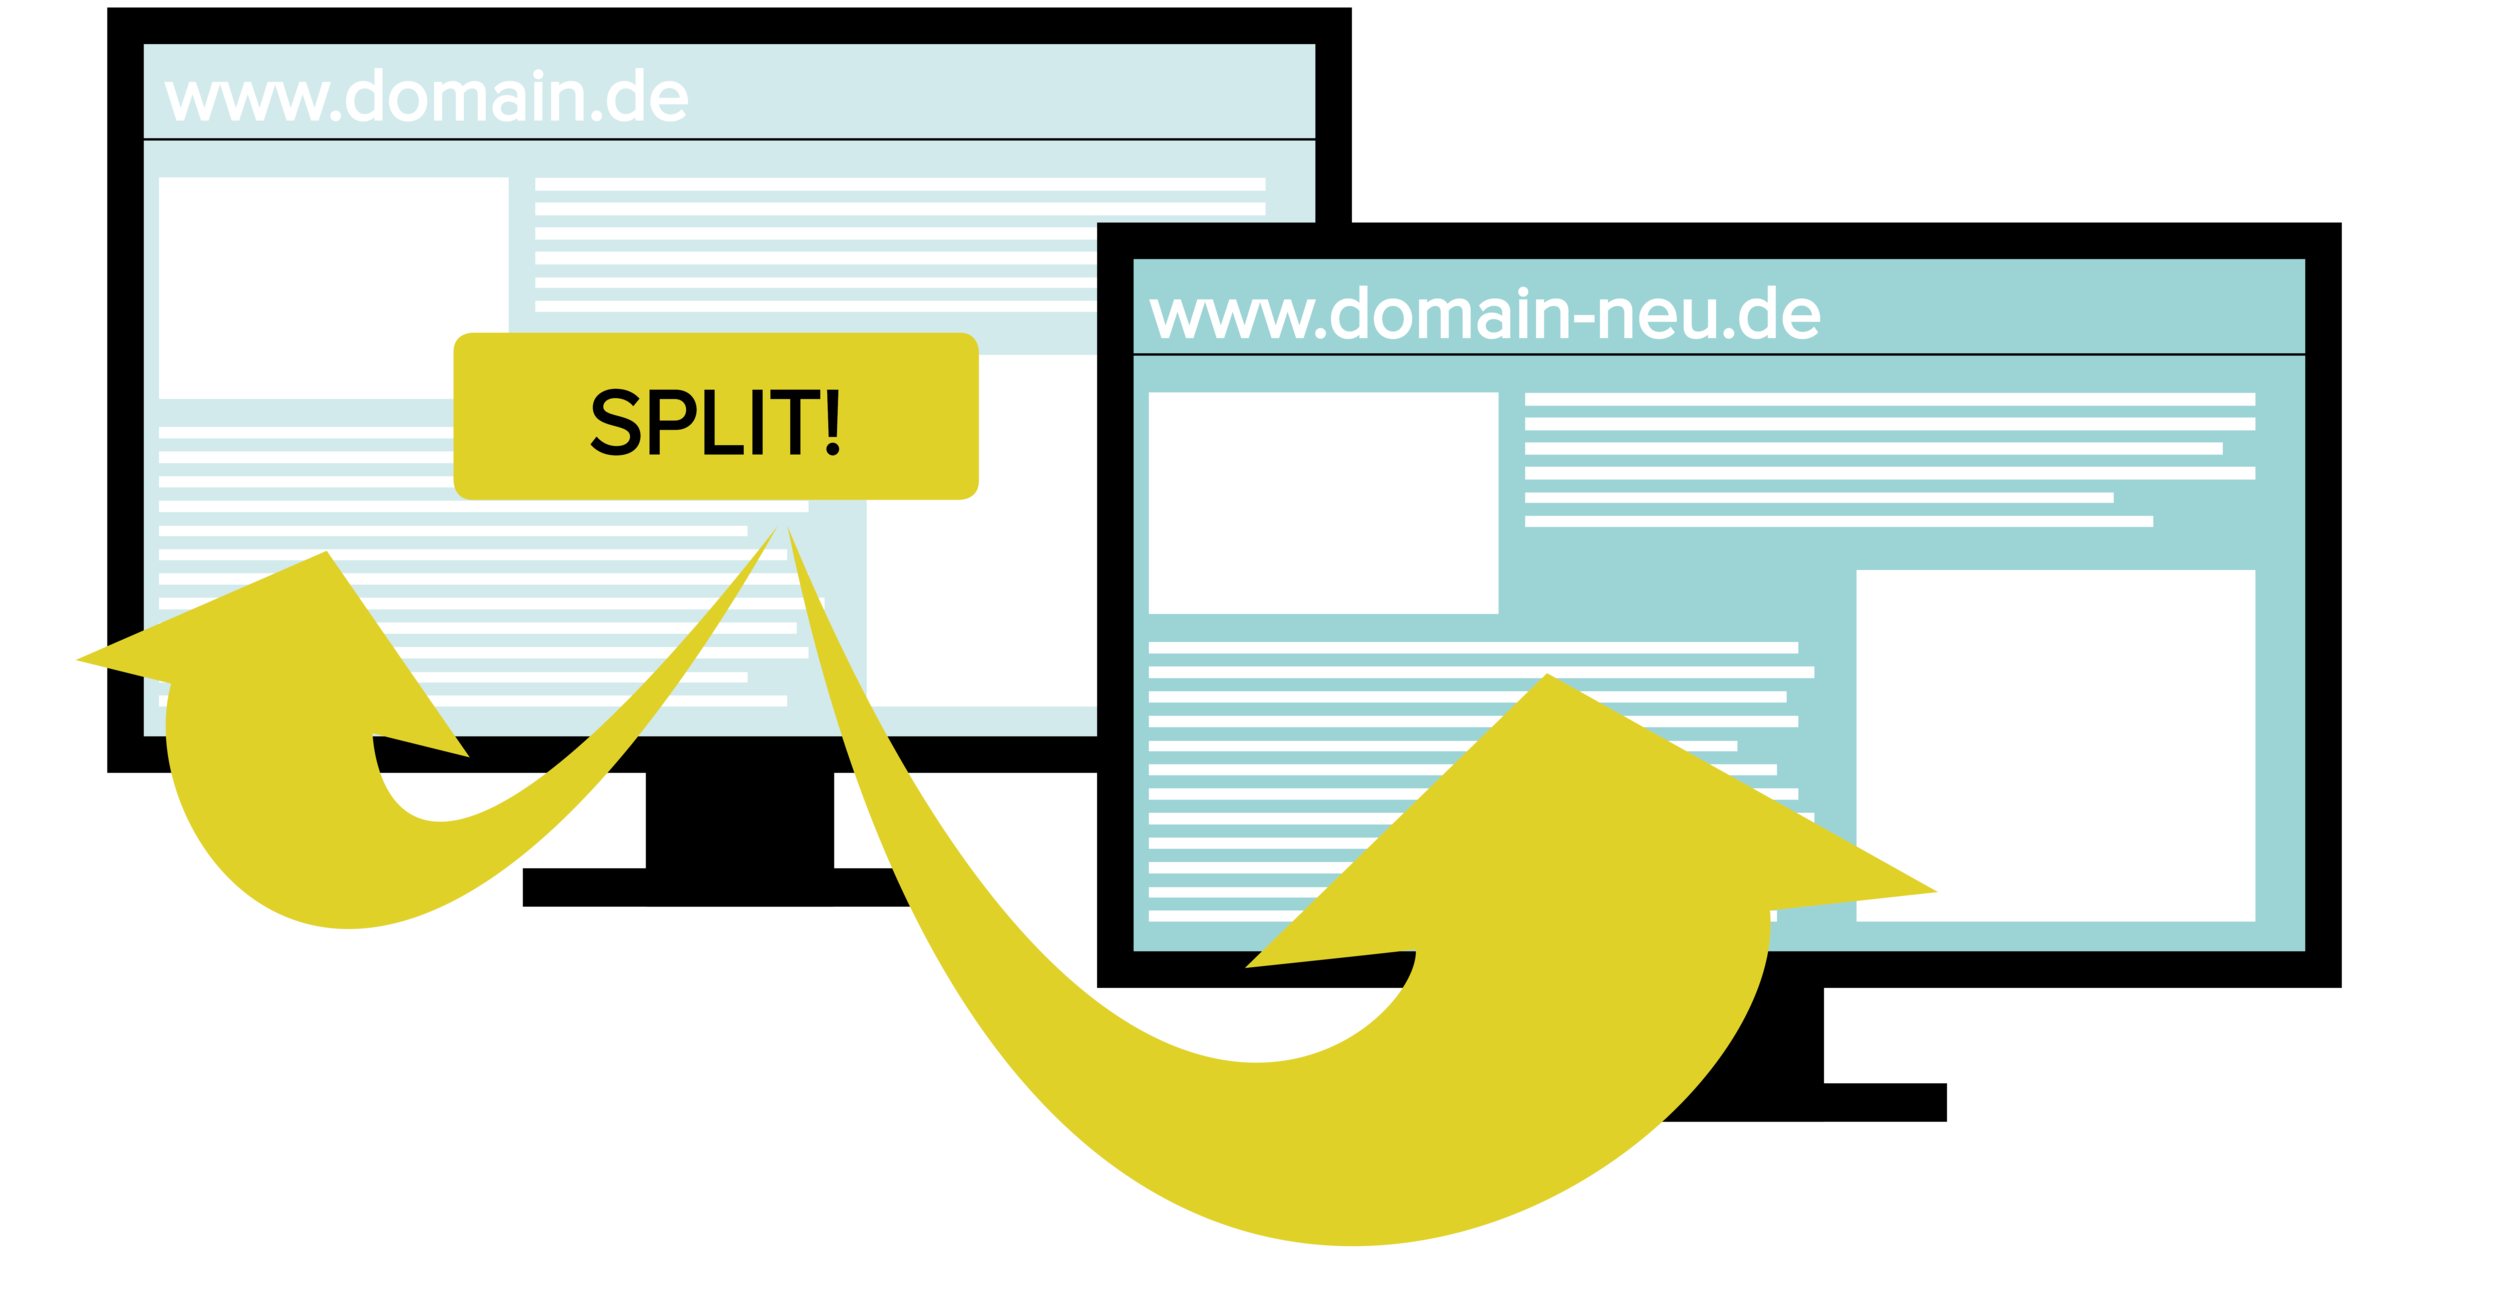 domain-splitting-special-interest-site-als-seo-trend-markop.png